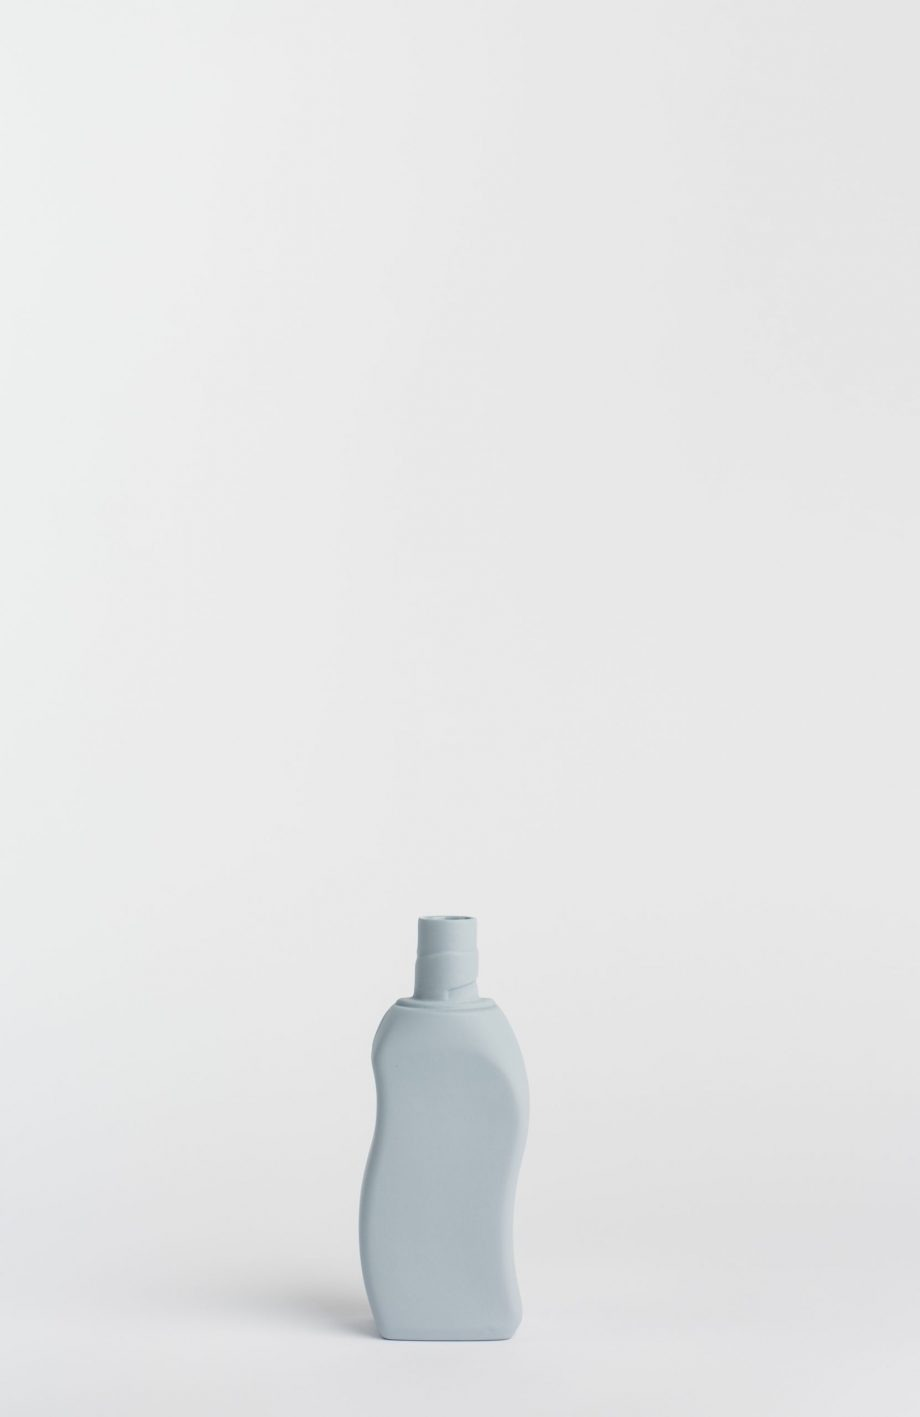 bottlevase #12 light purple